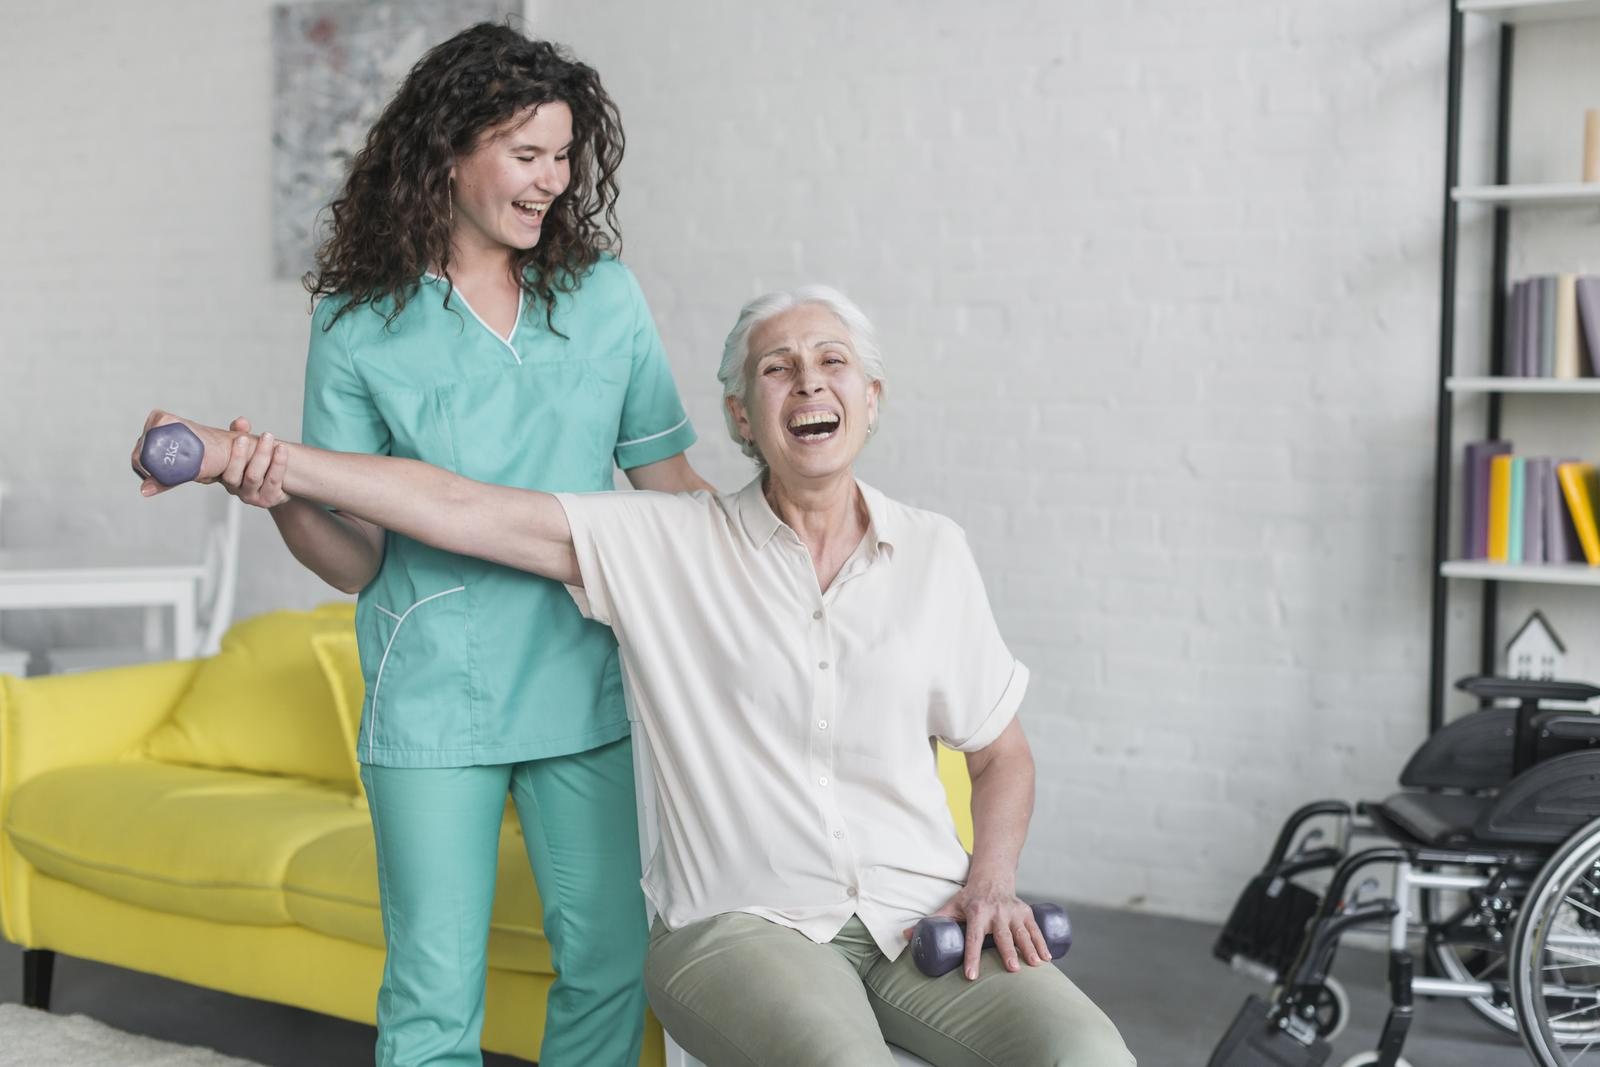 Residential nursing care activities in Tallinn